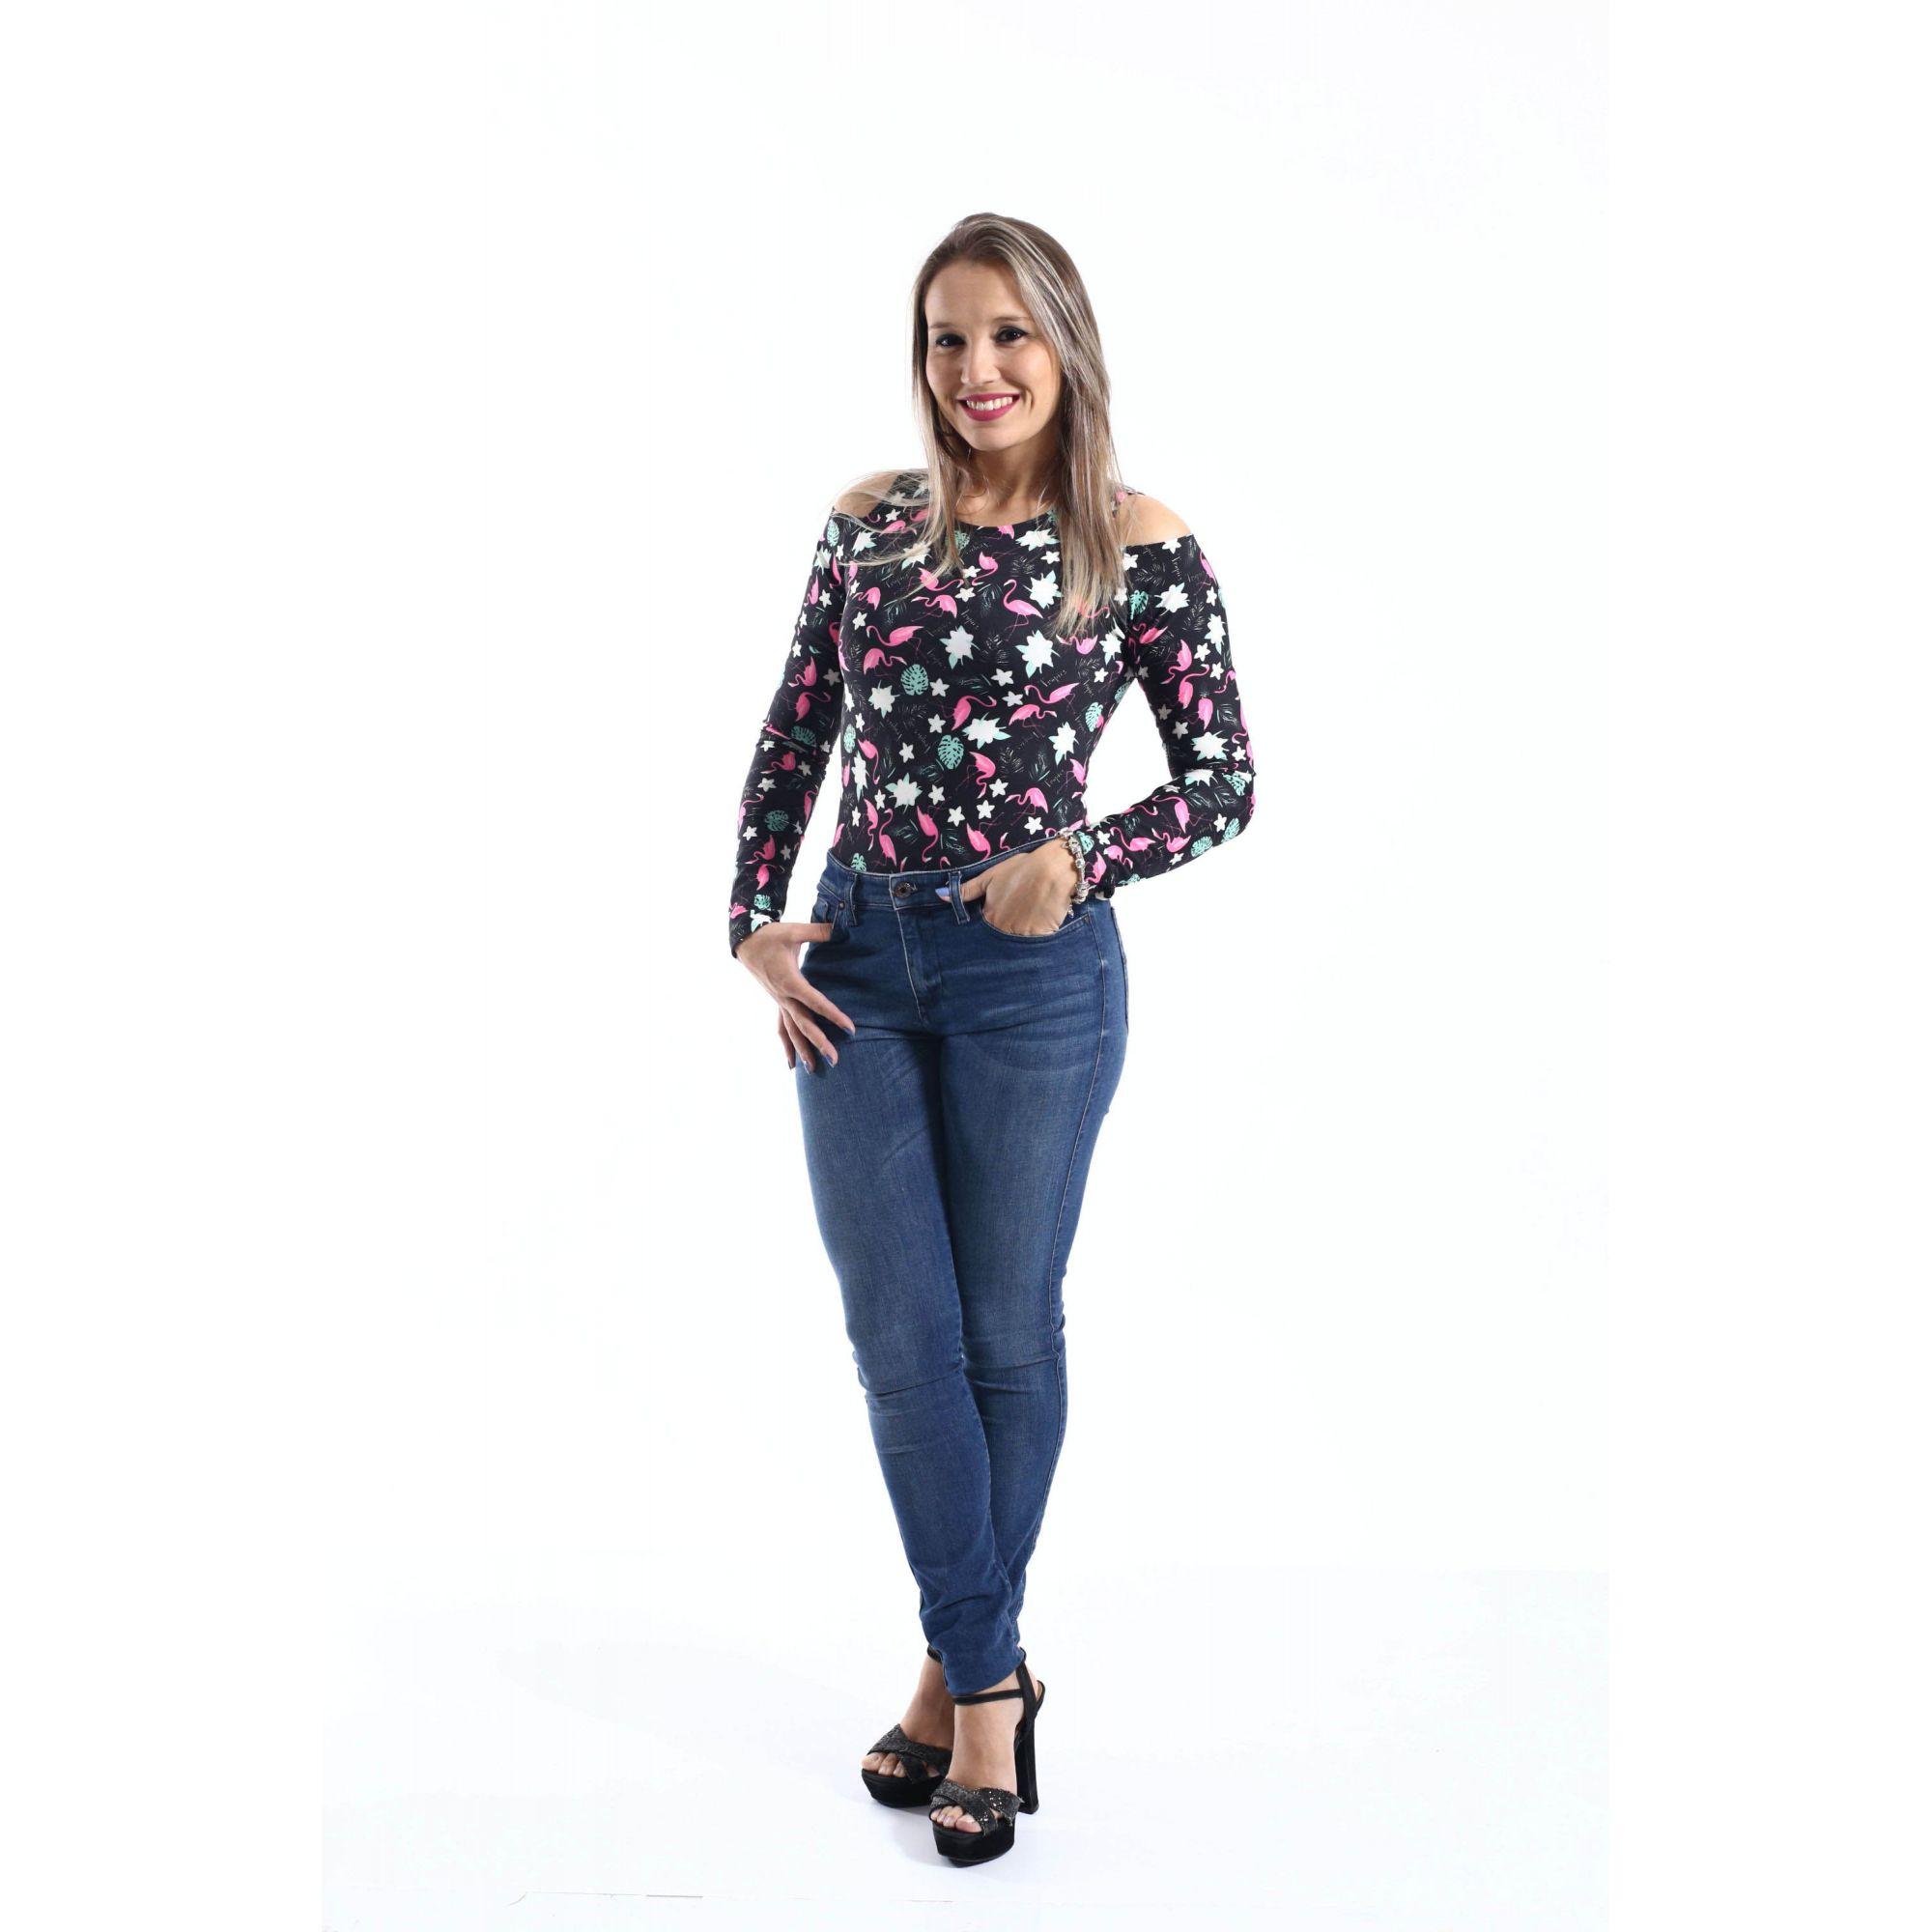 Body Feminino Adulto Flamingo Manga Longa  - Heitor Fashion Brazil